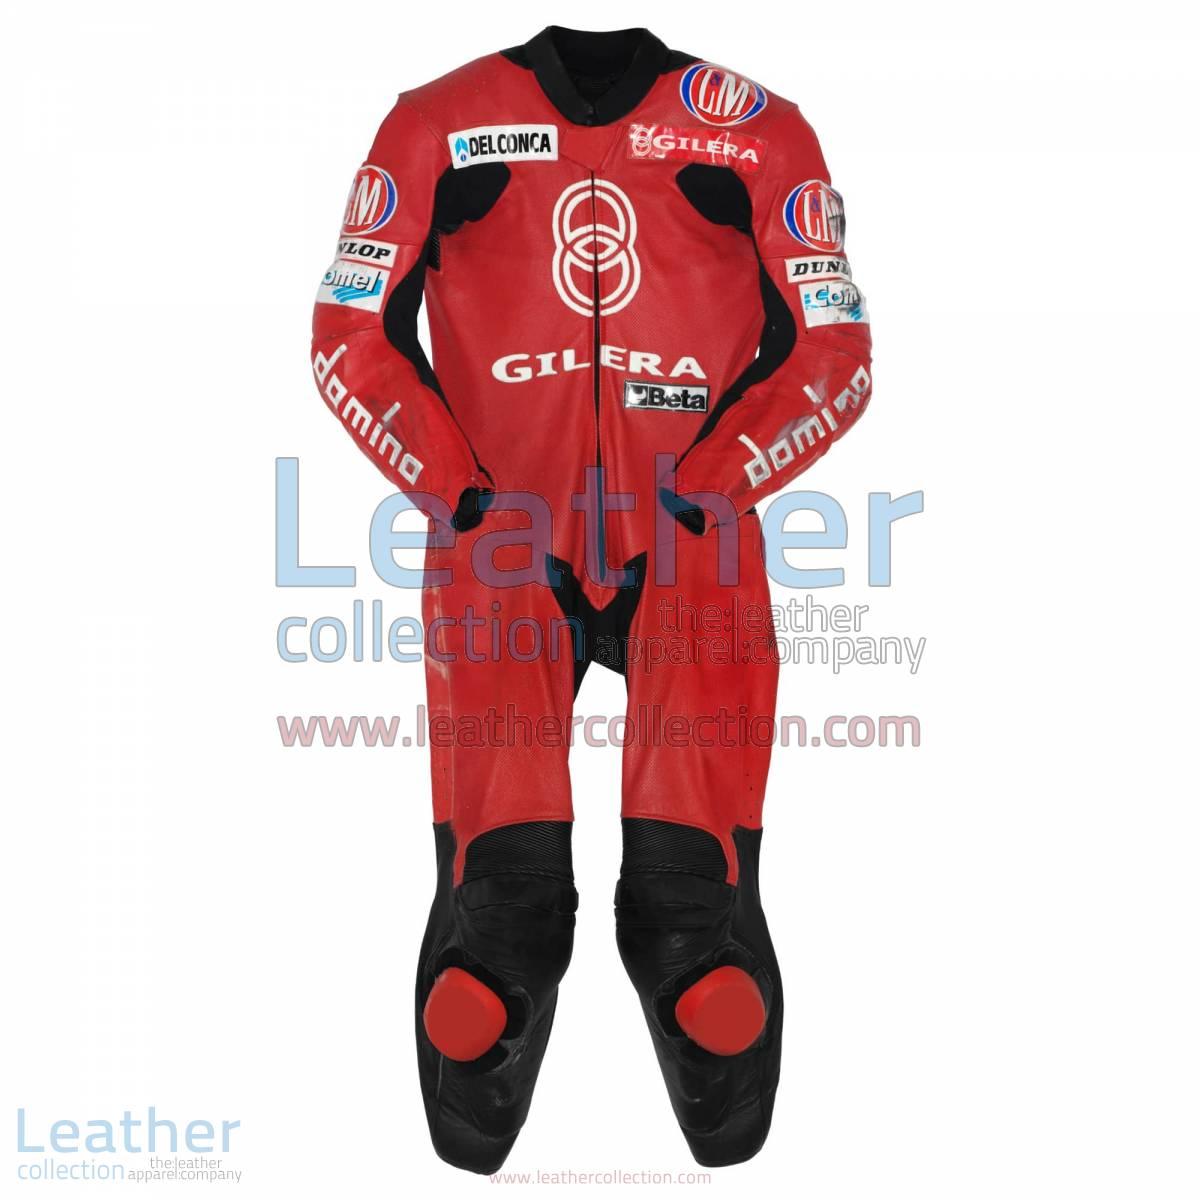 Manuel Poggiali Gilera Motorcycle Race Suit GP 2001 | motorcycle race suit